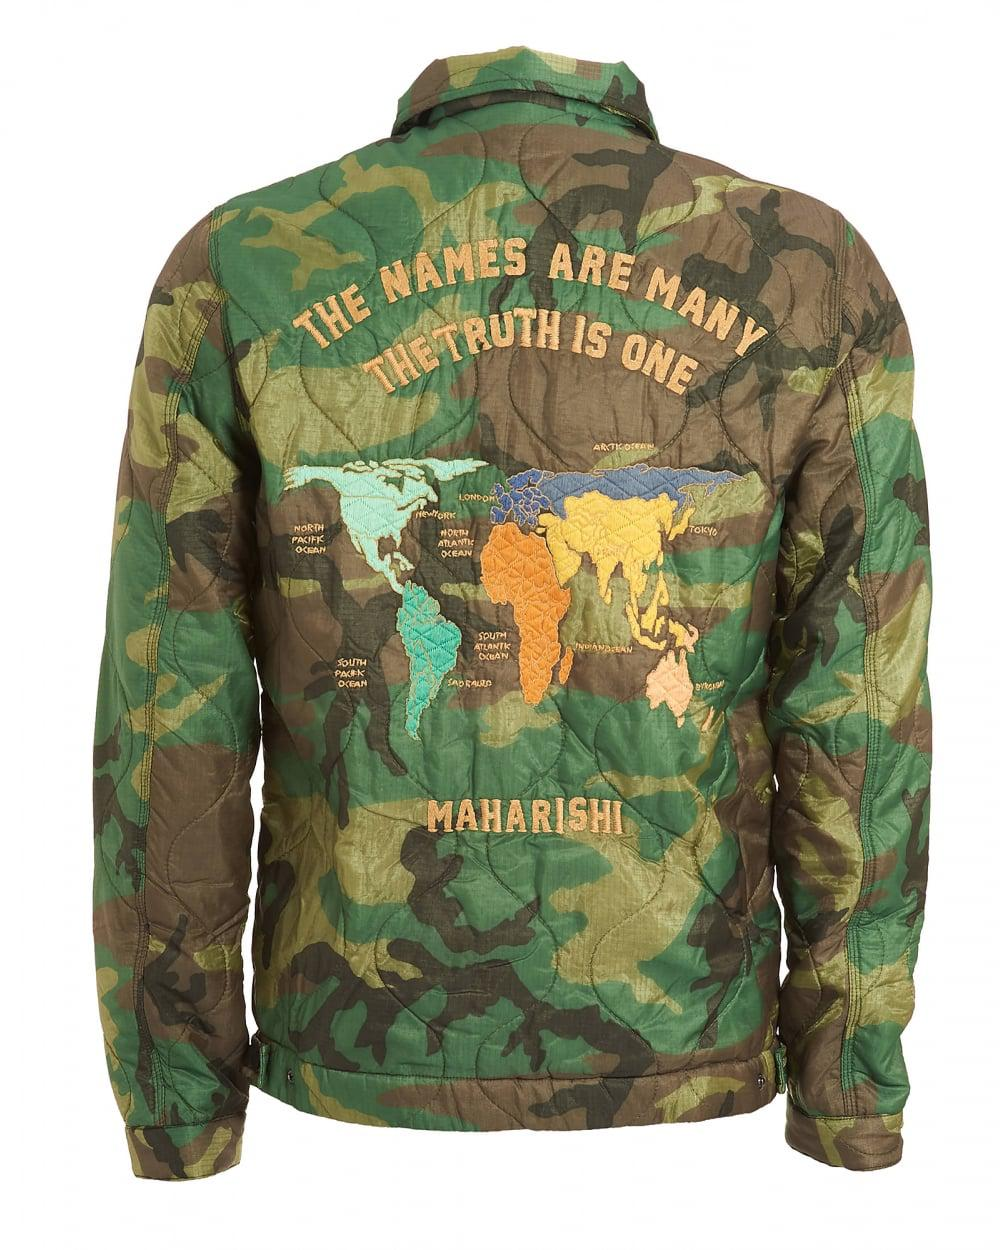 World Map Jacket, Vintage Military Surplus Woodland Green Coat